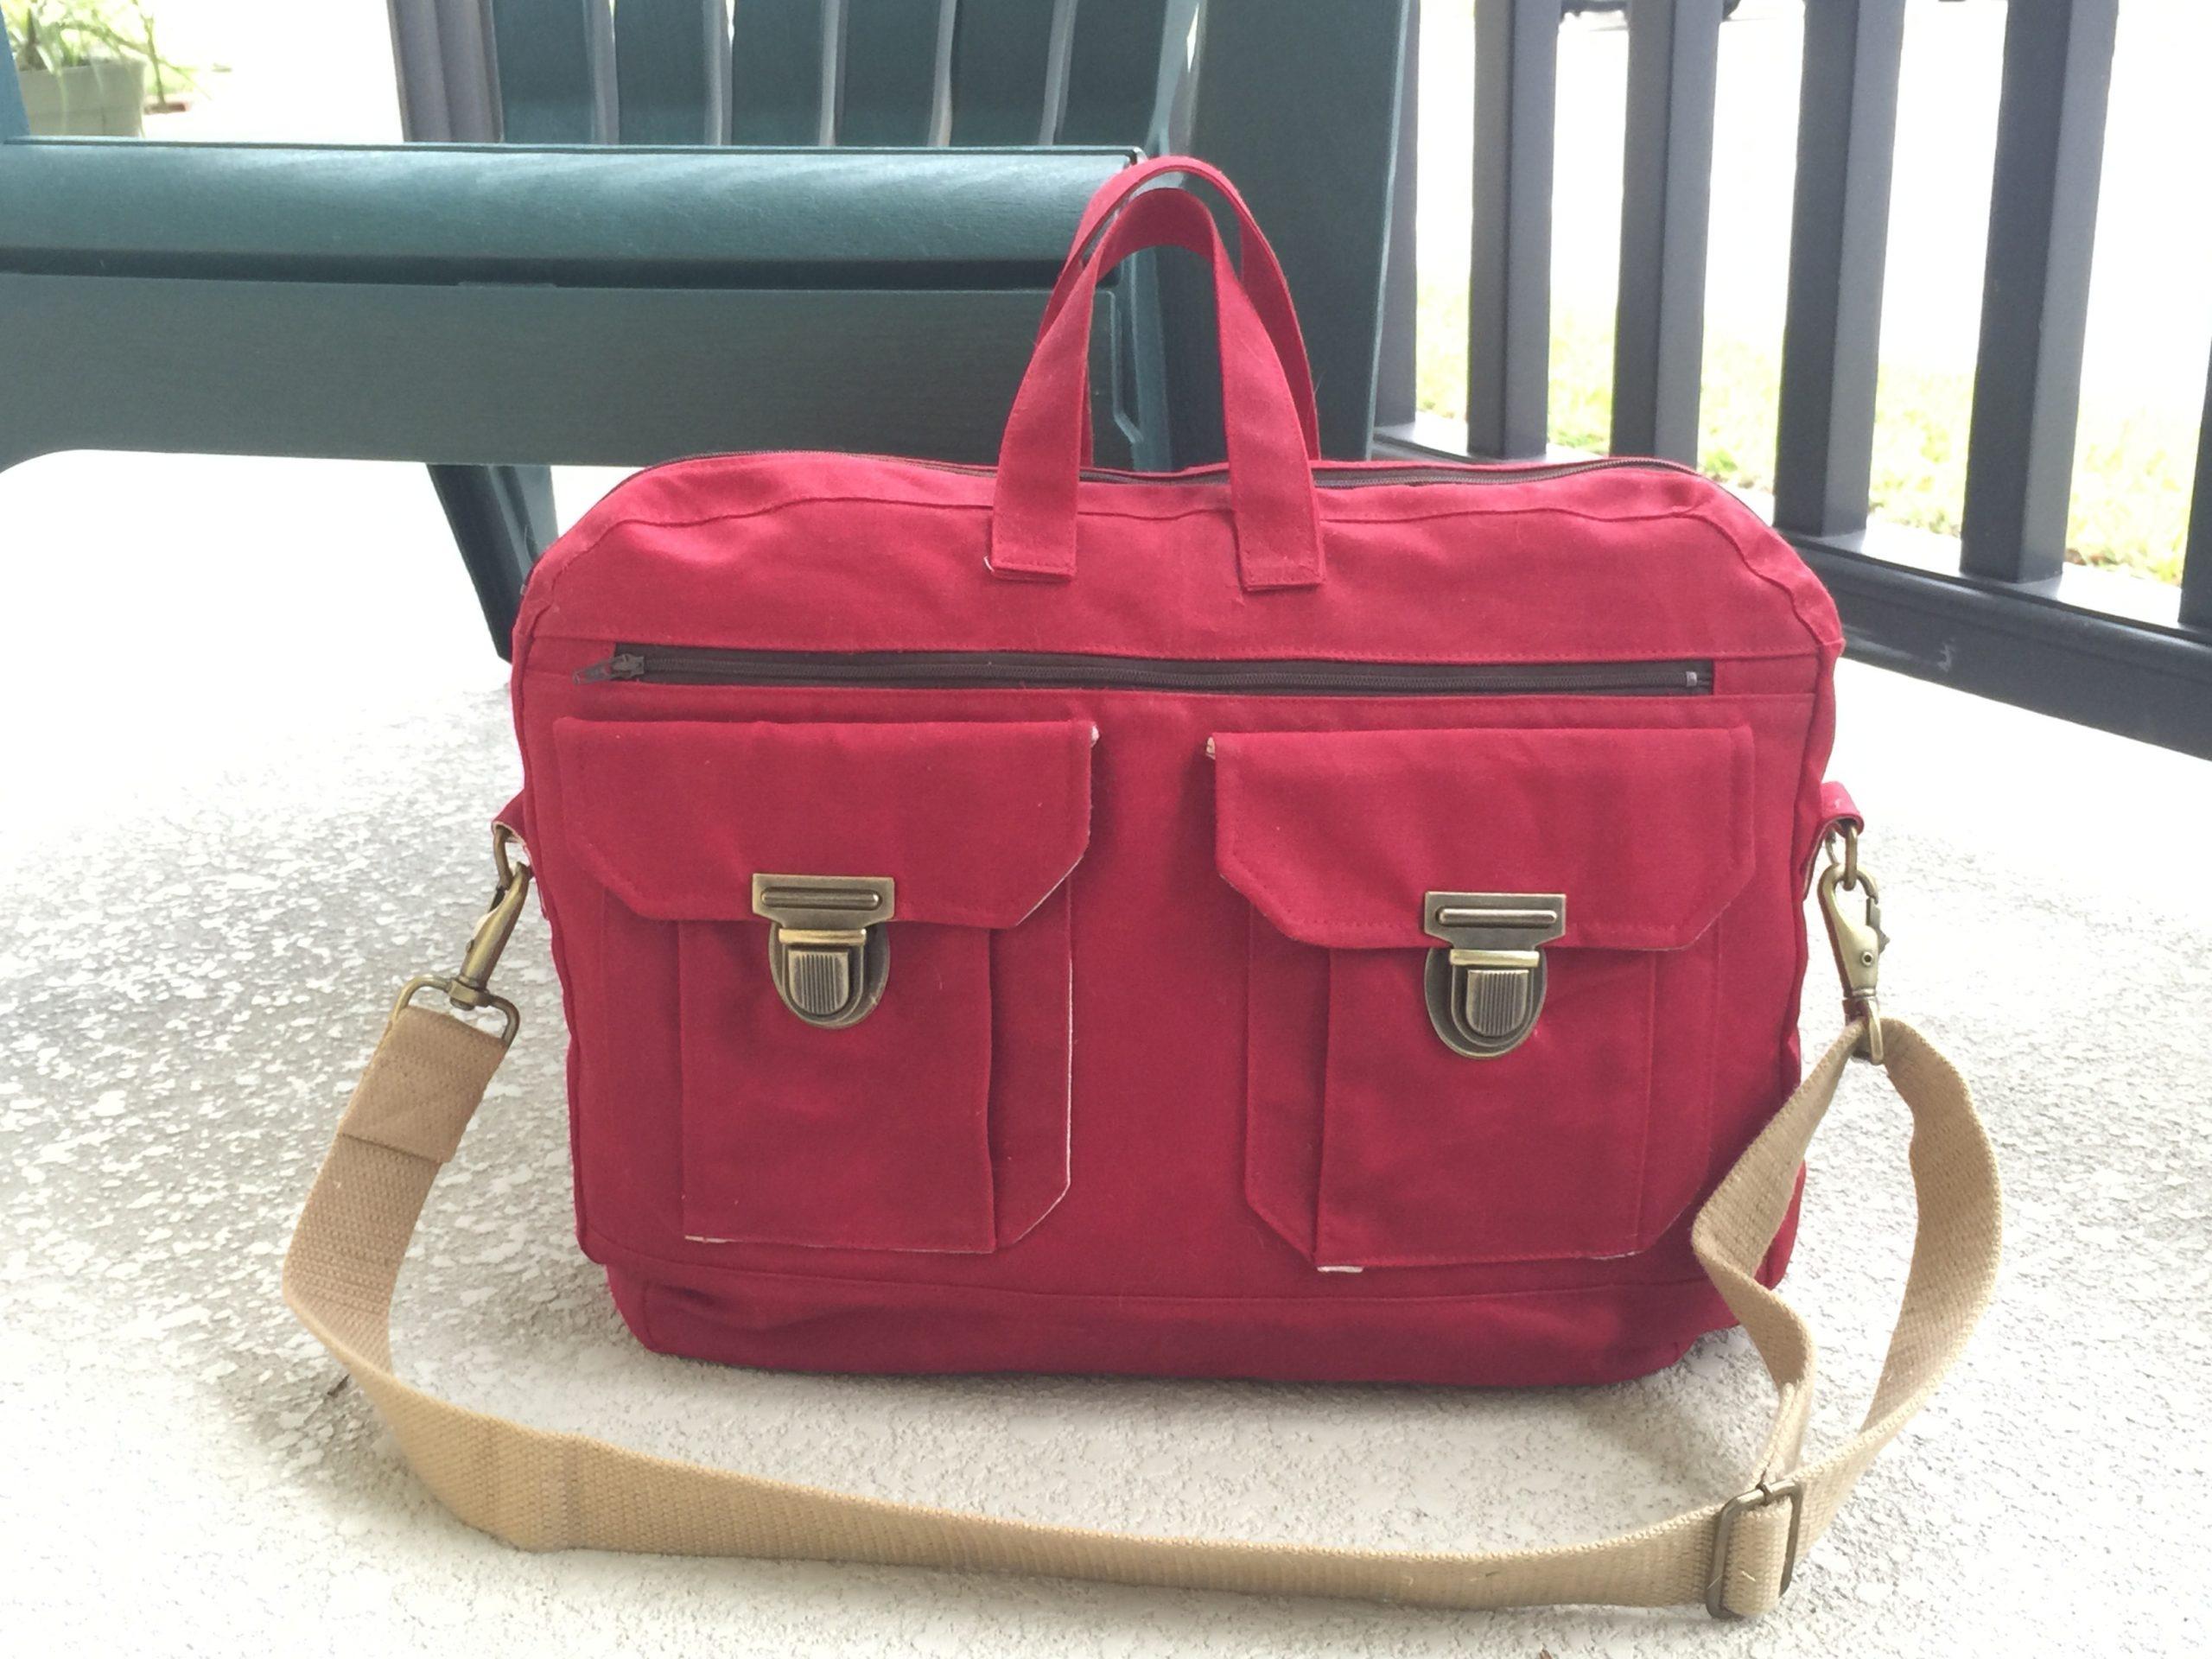 February's Bag of the Month Revealed! The Ravenwood Messenger Bag